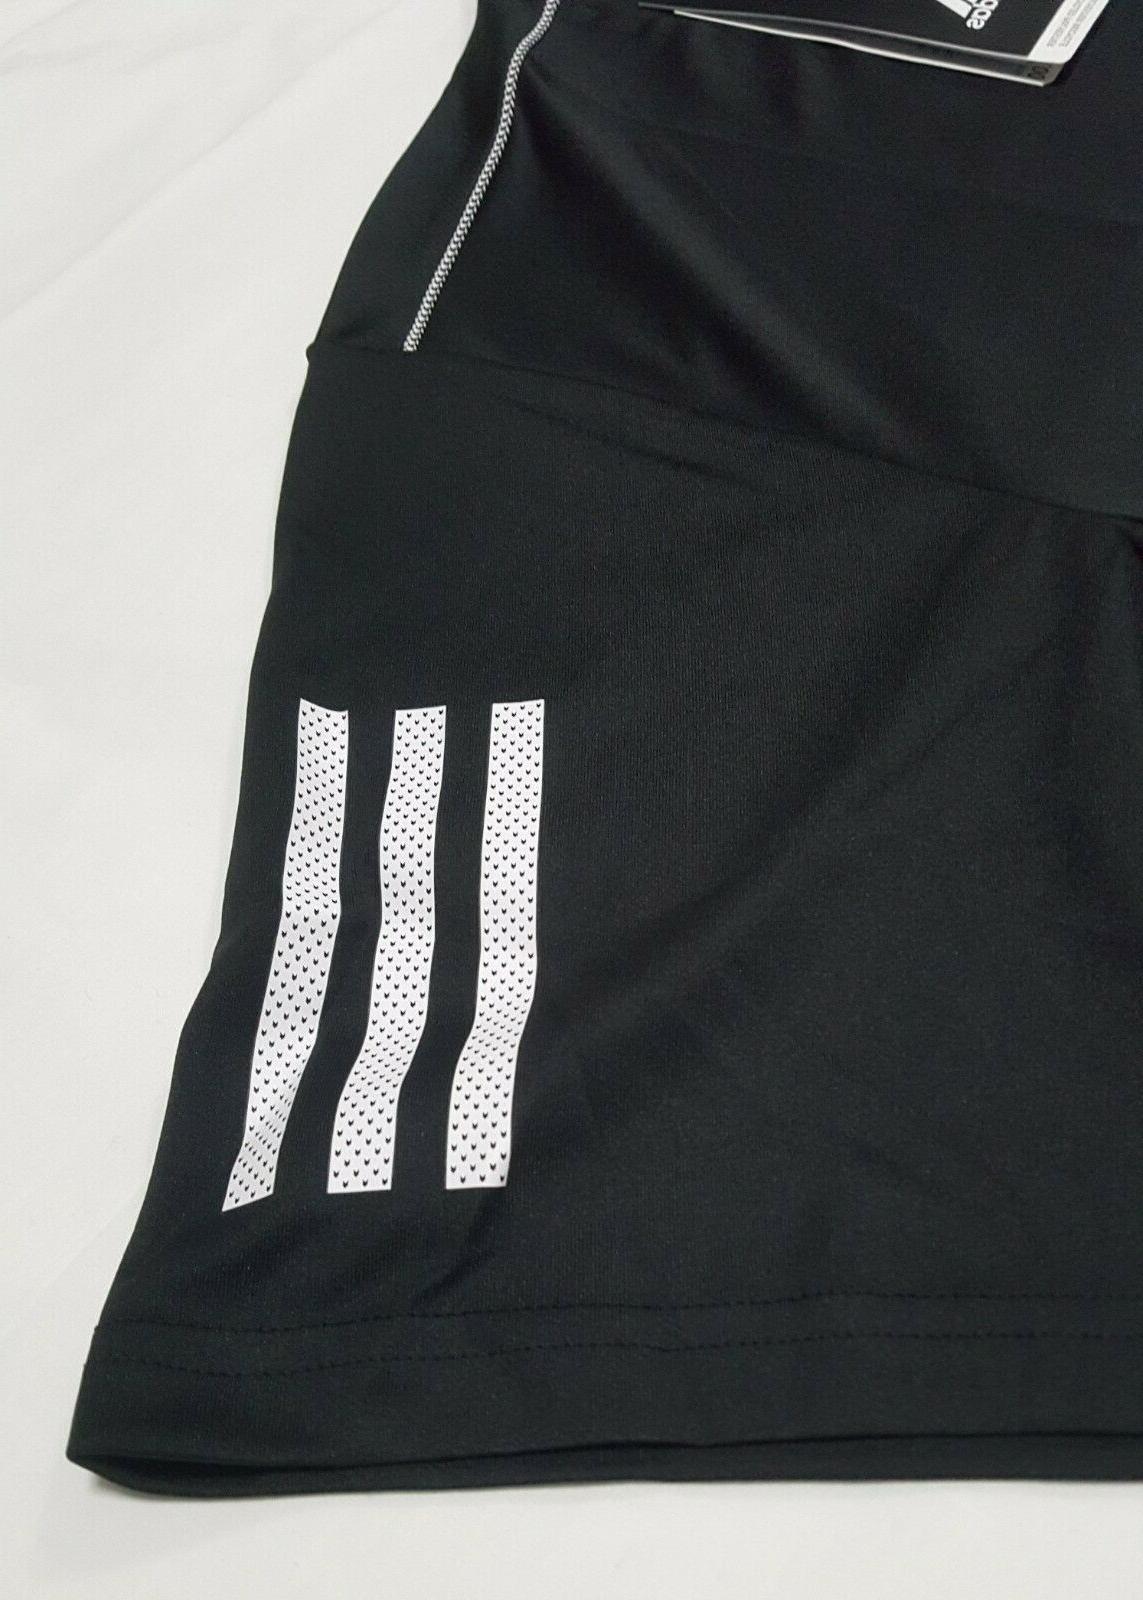 Adidas 3-Stripes Club Tee White Breathable DU0859